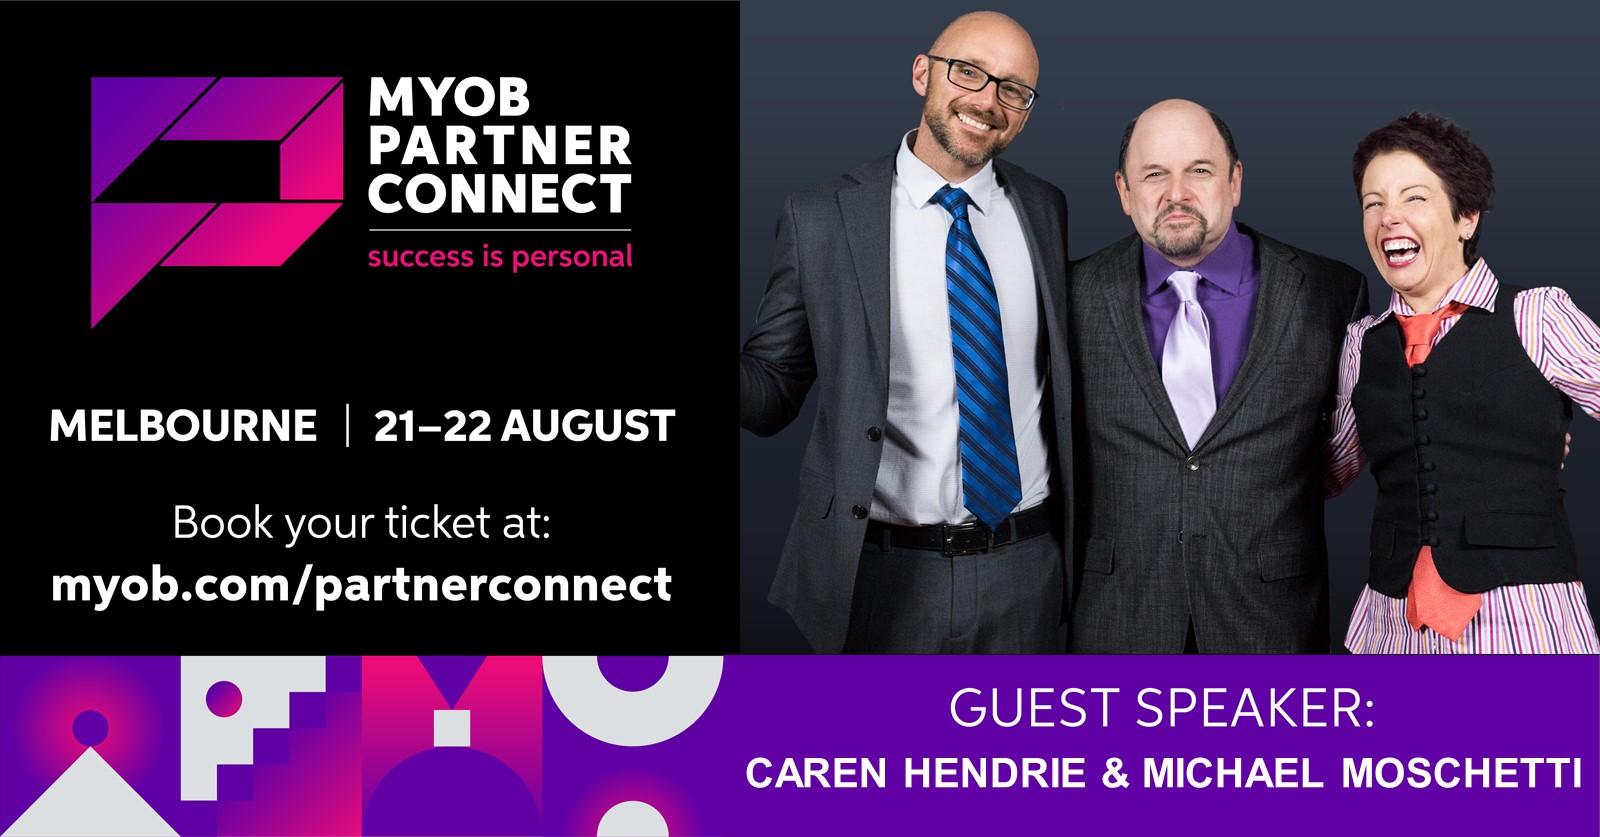 MYOB Partner Connect